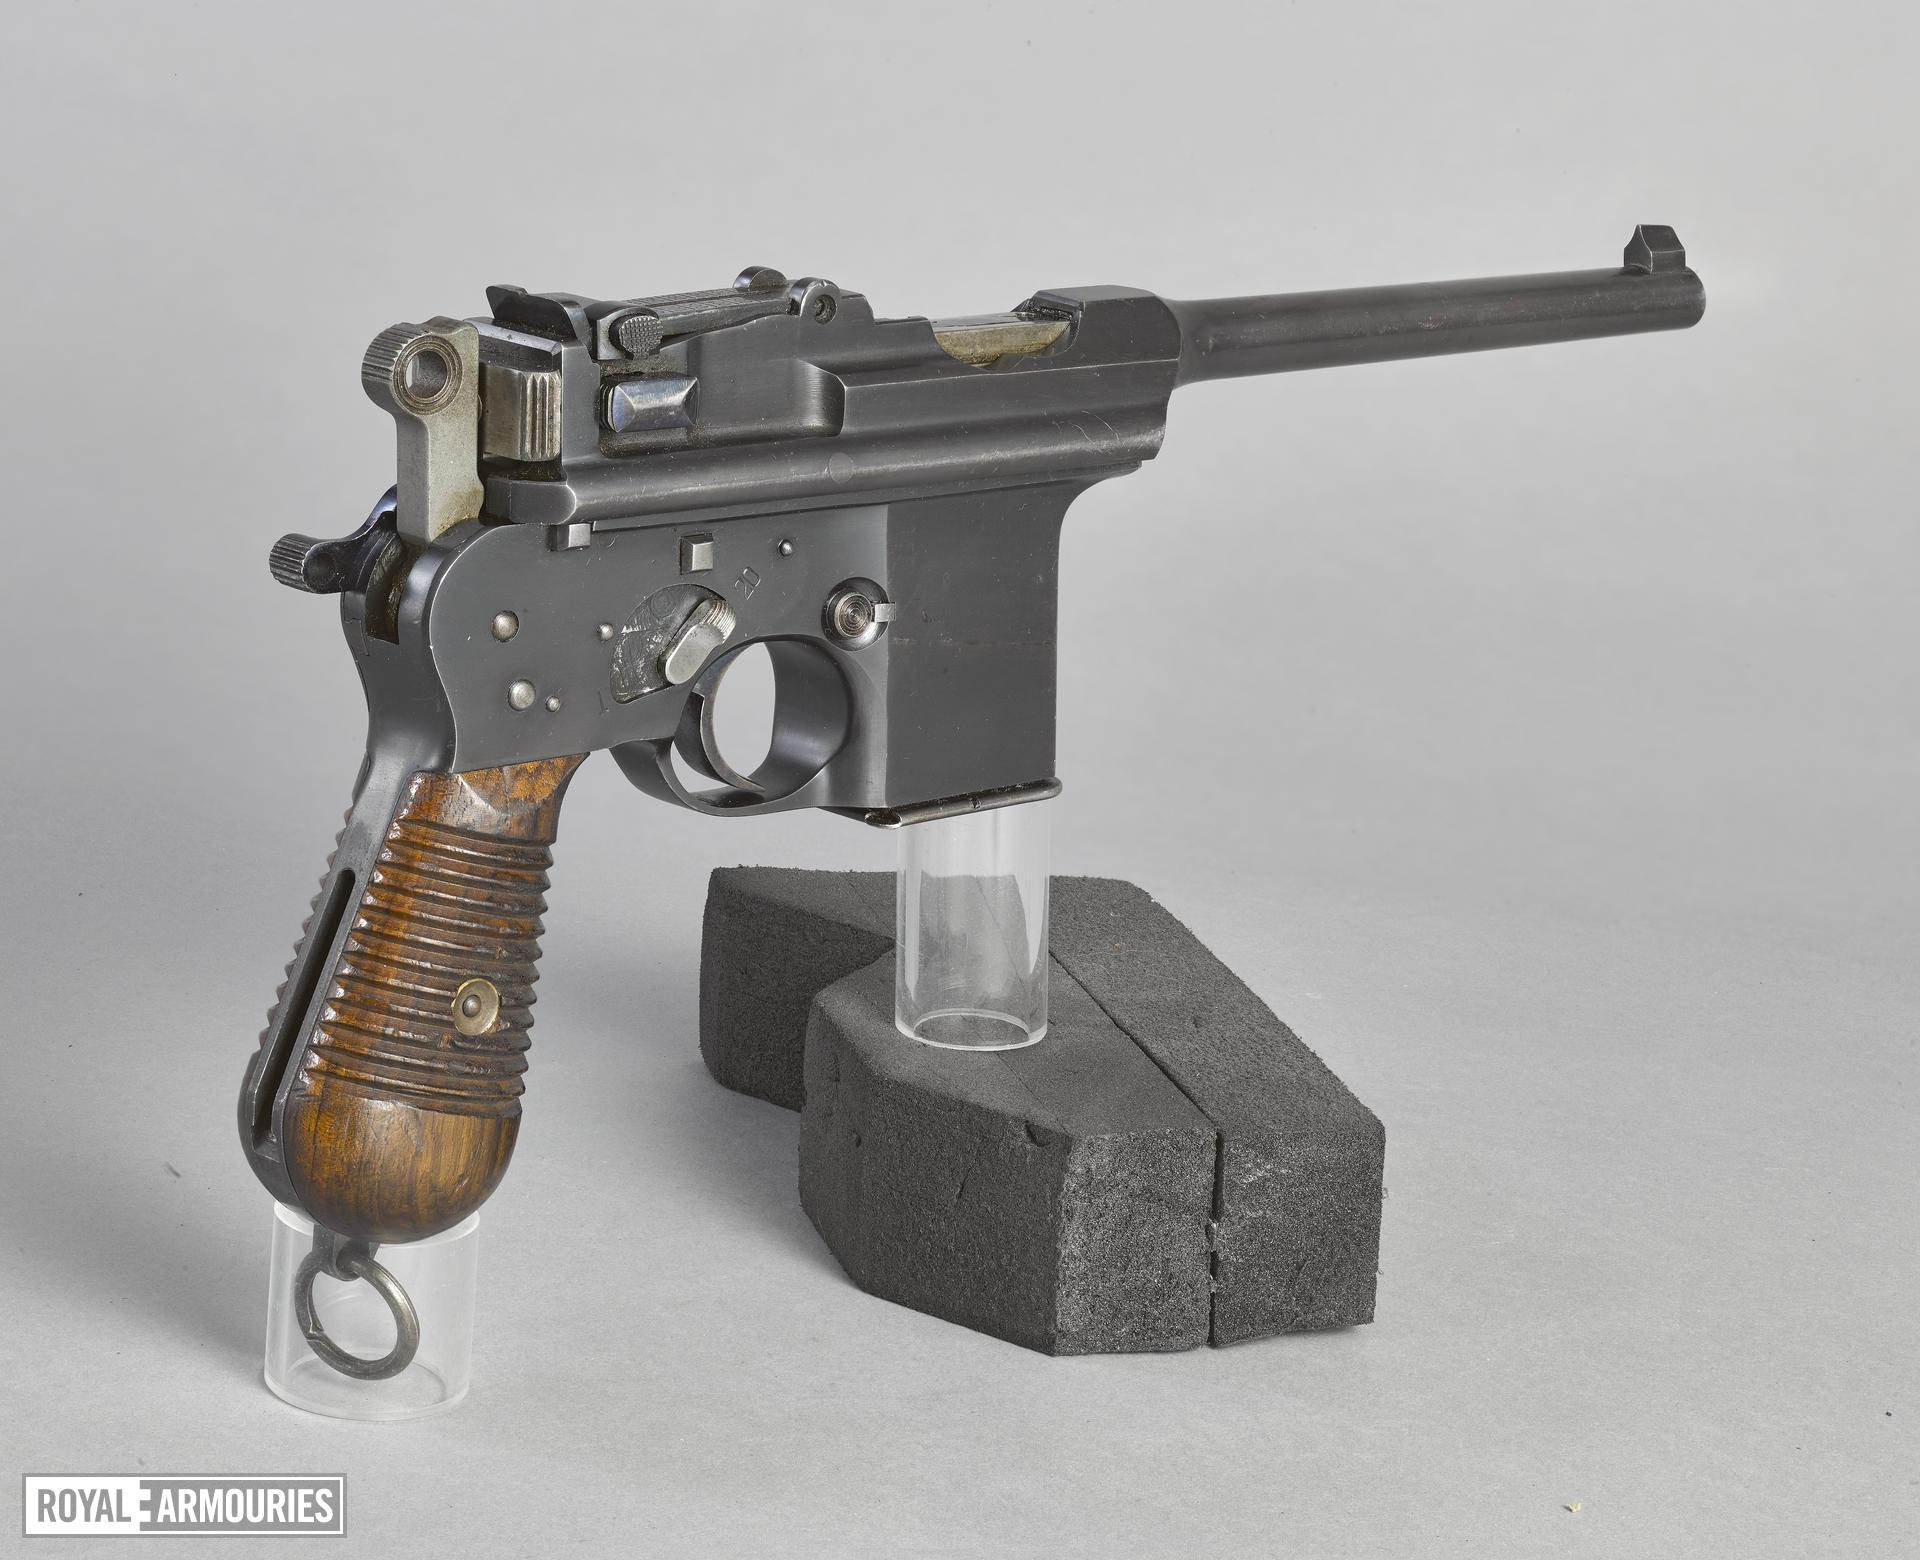 Centrefire automatic pistol - Astra M903